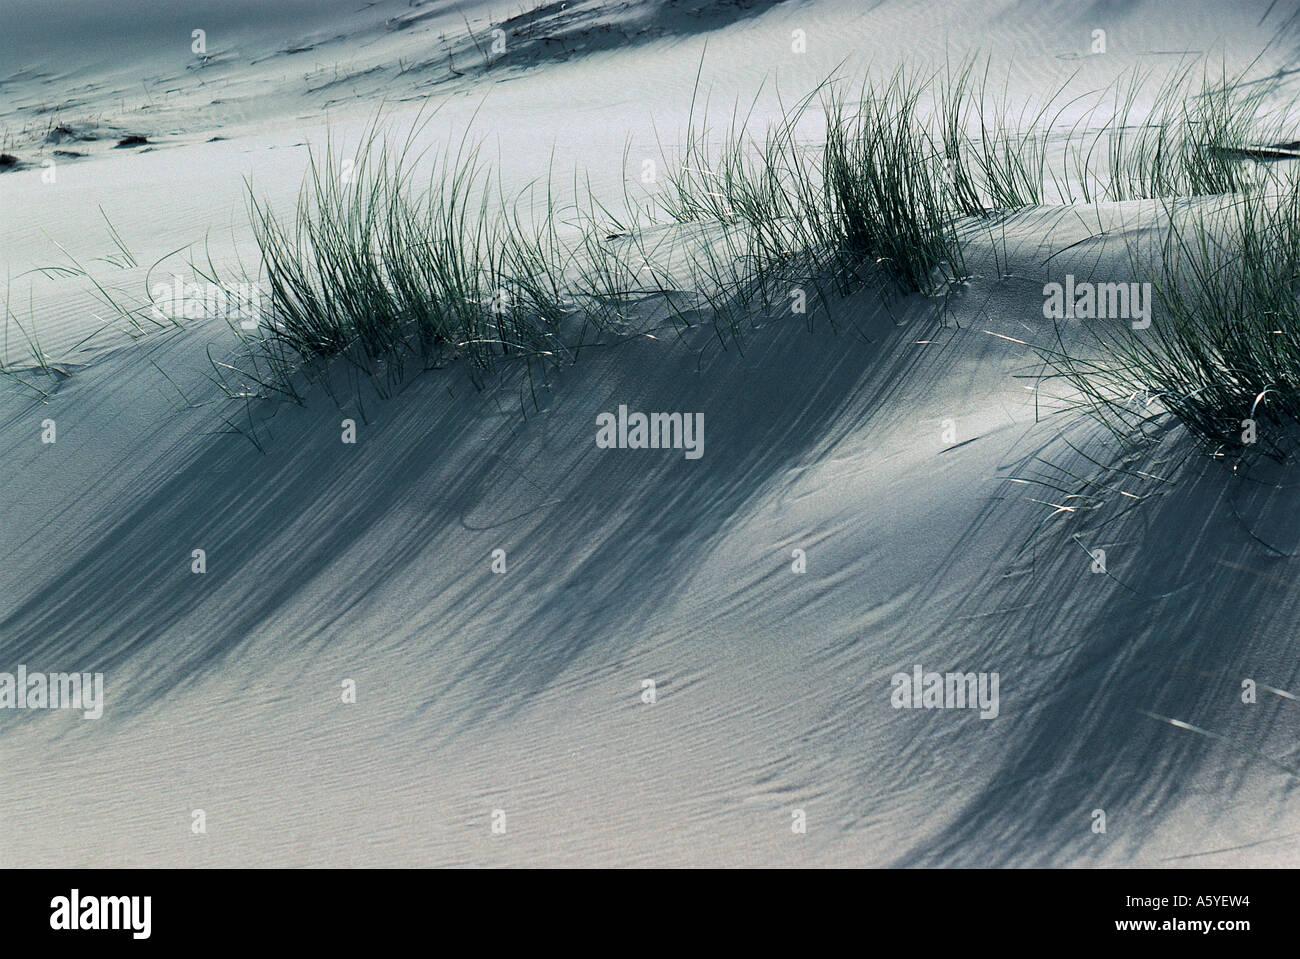 Marram grass (Ammophilia arenaria) on white sand dunes, Amrum Island, Germany - Stock Image